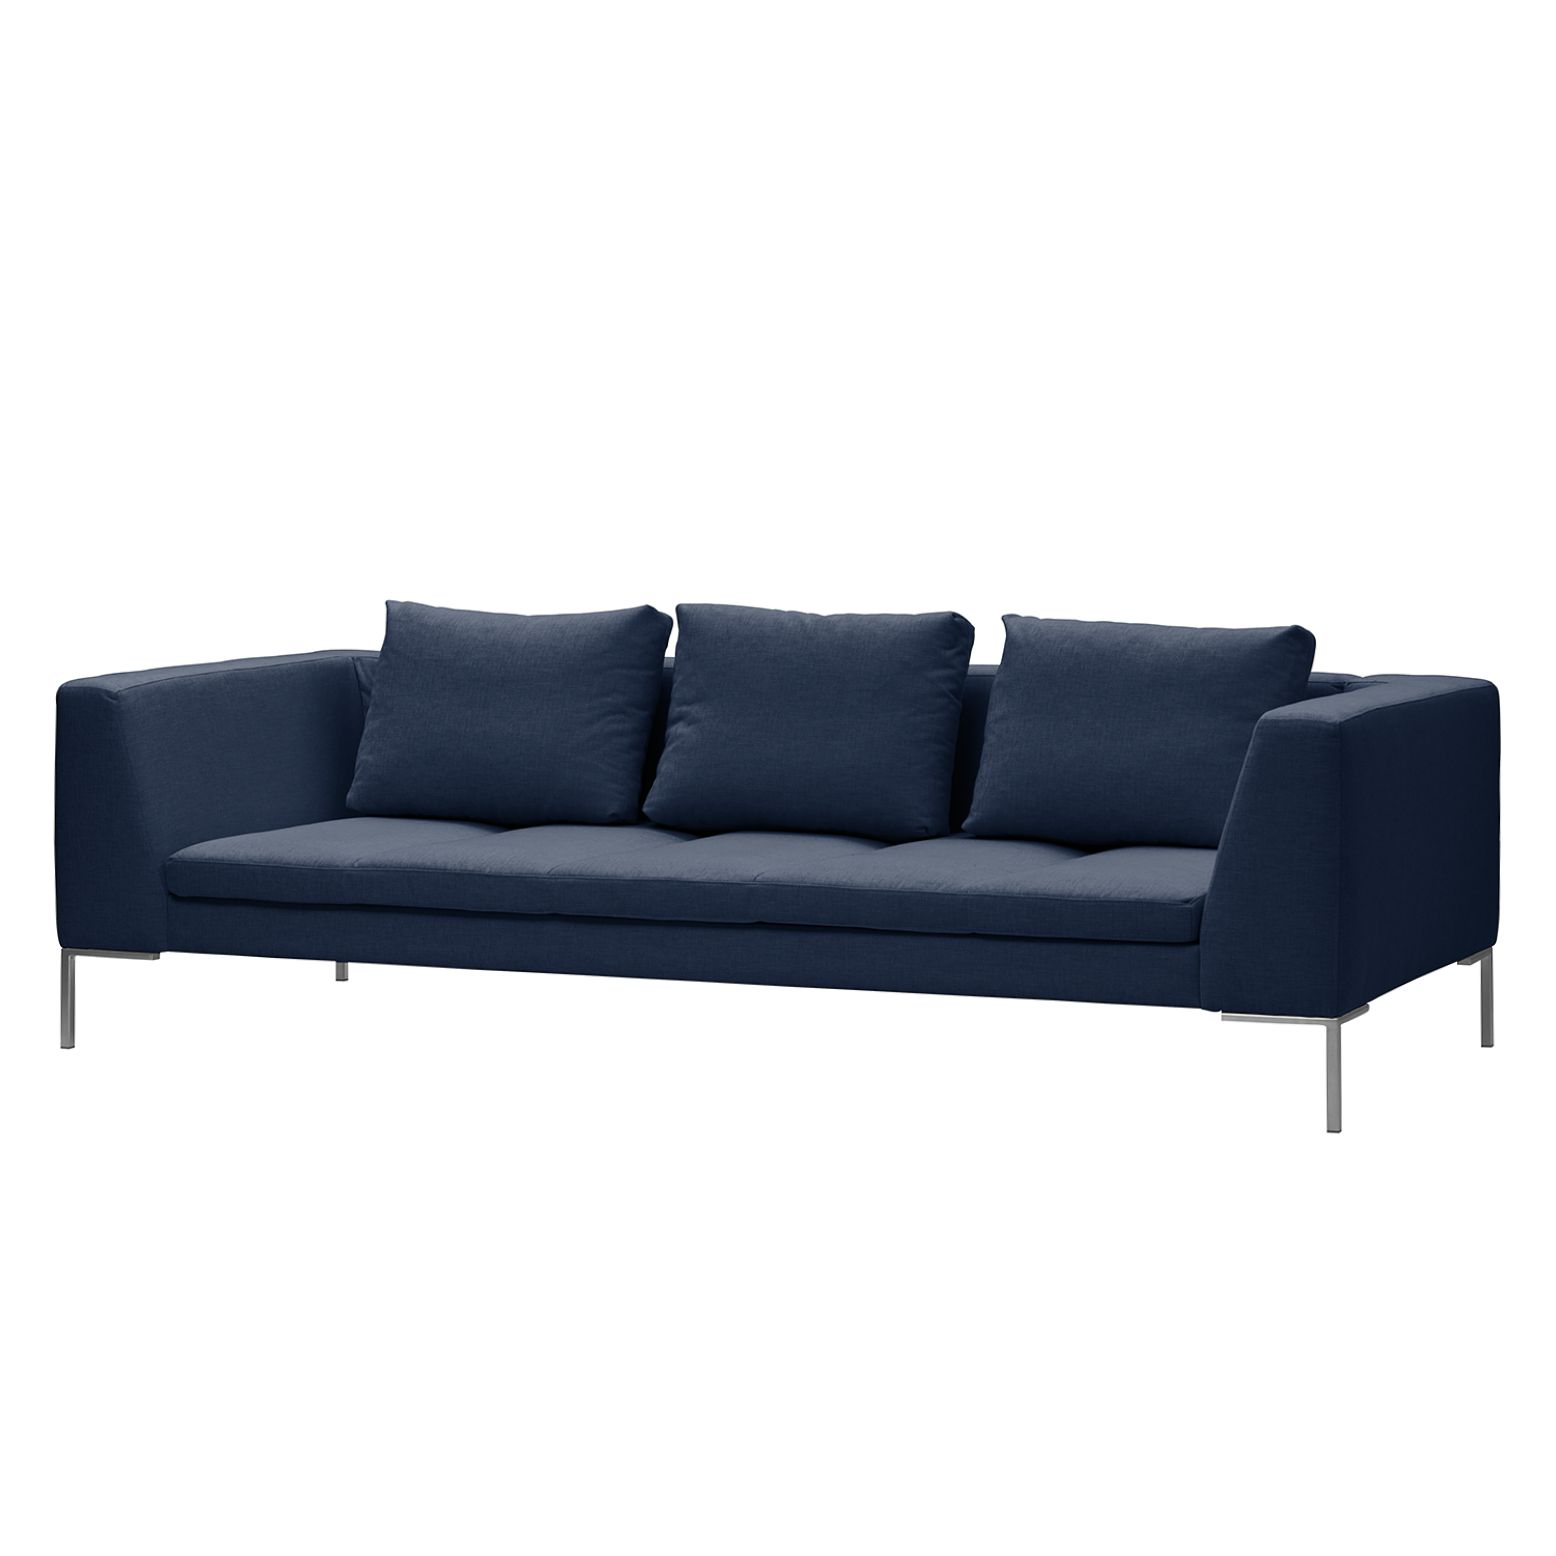 Sofa Madison (3-Sitzer) Webstoff - Stoff Milan Dunkelblau